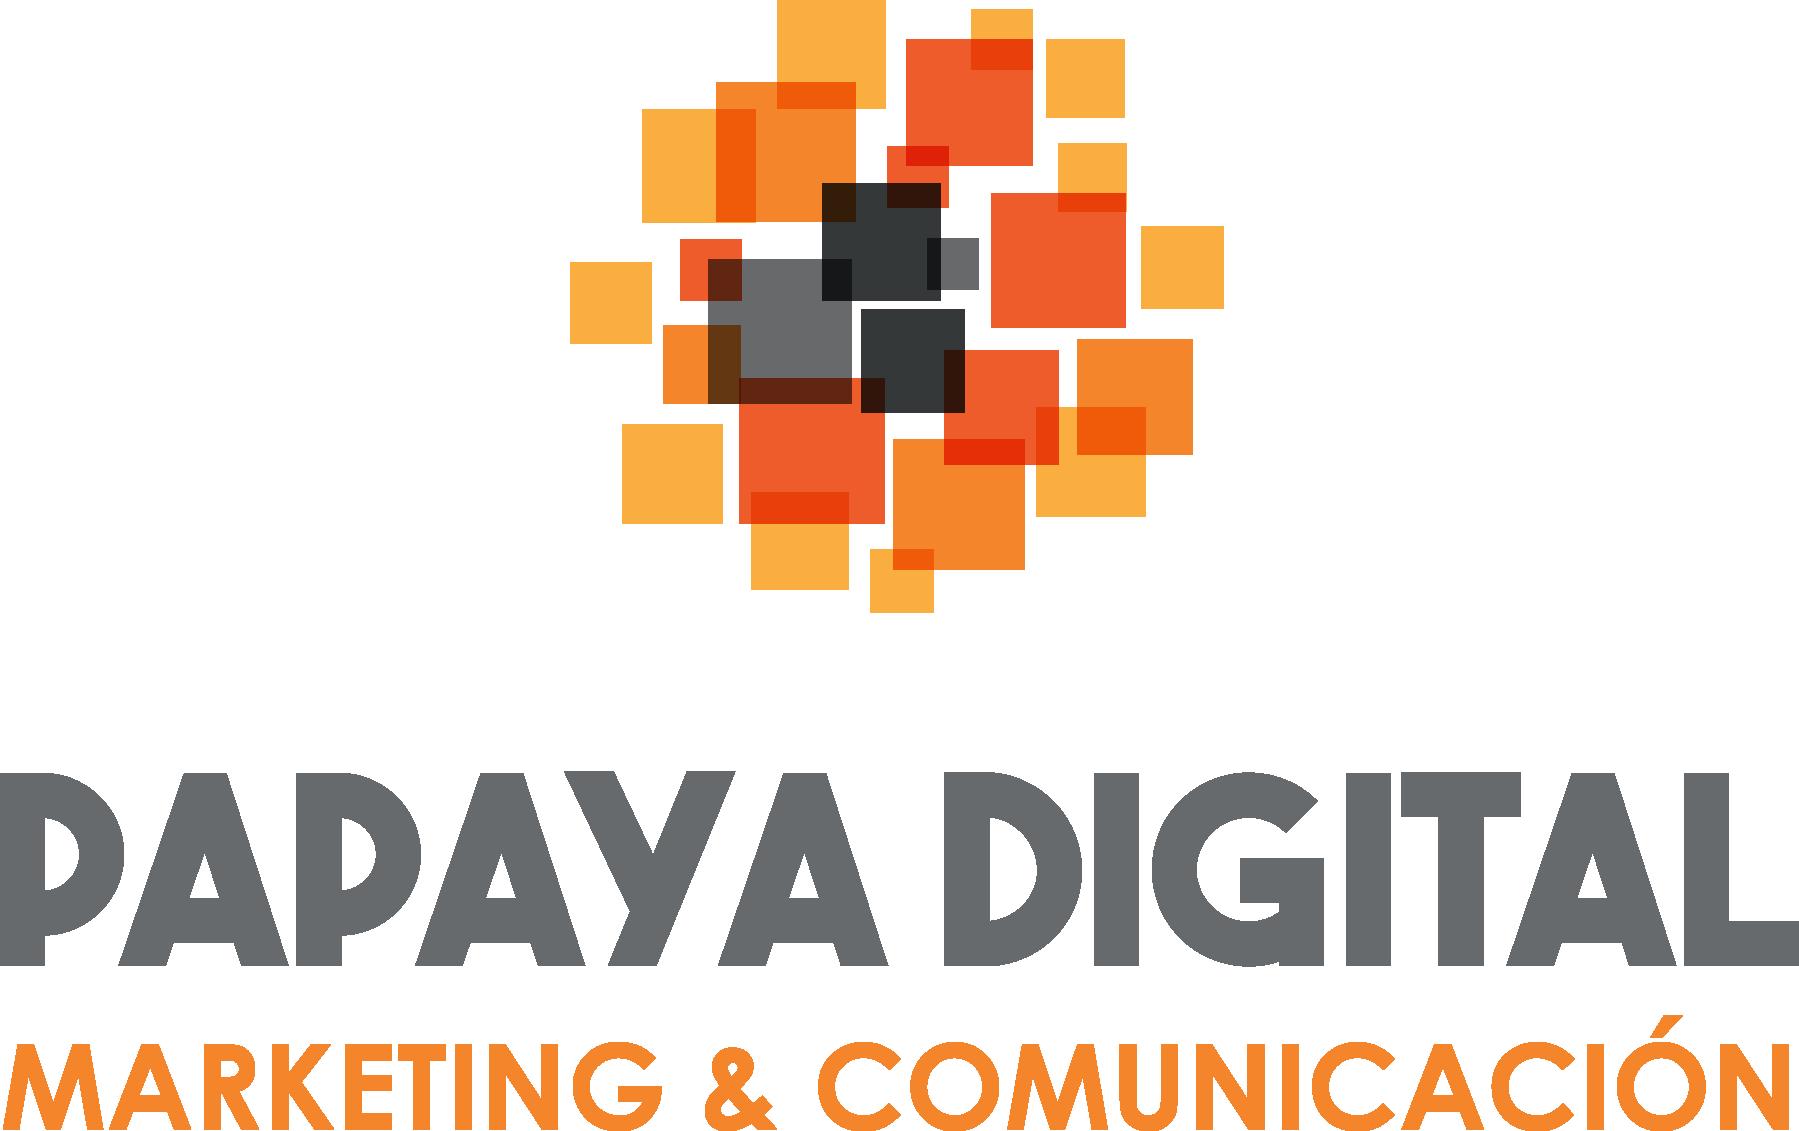 Papaya Digital